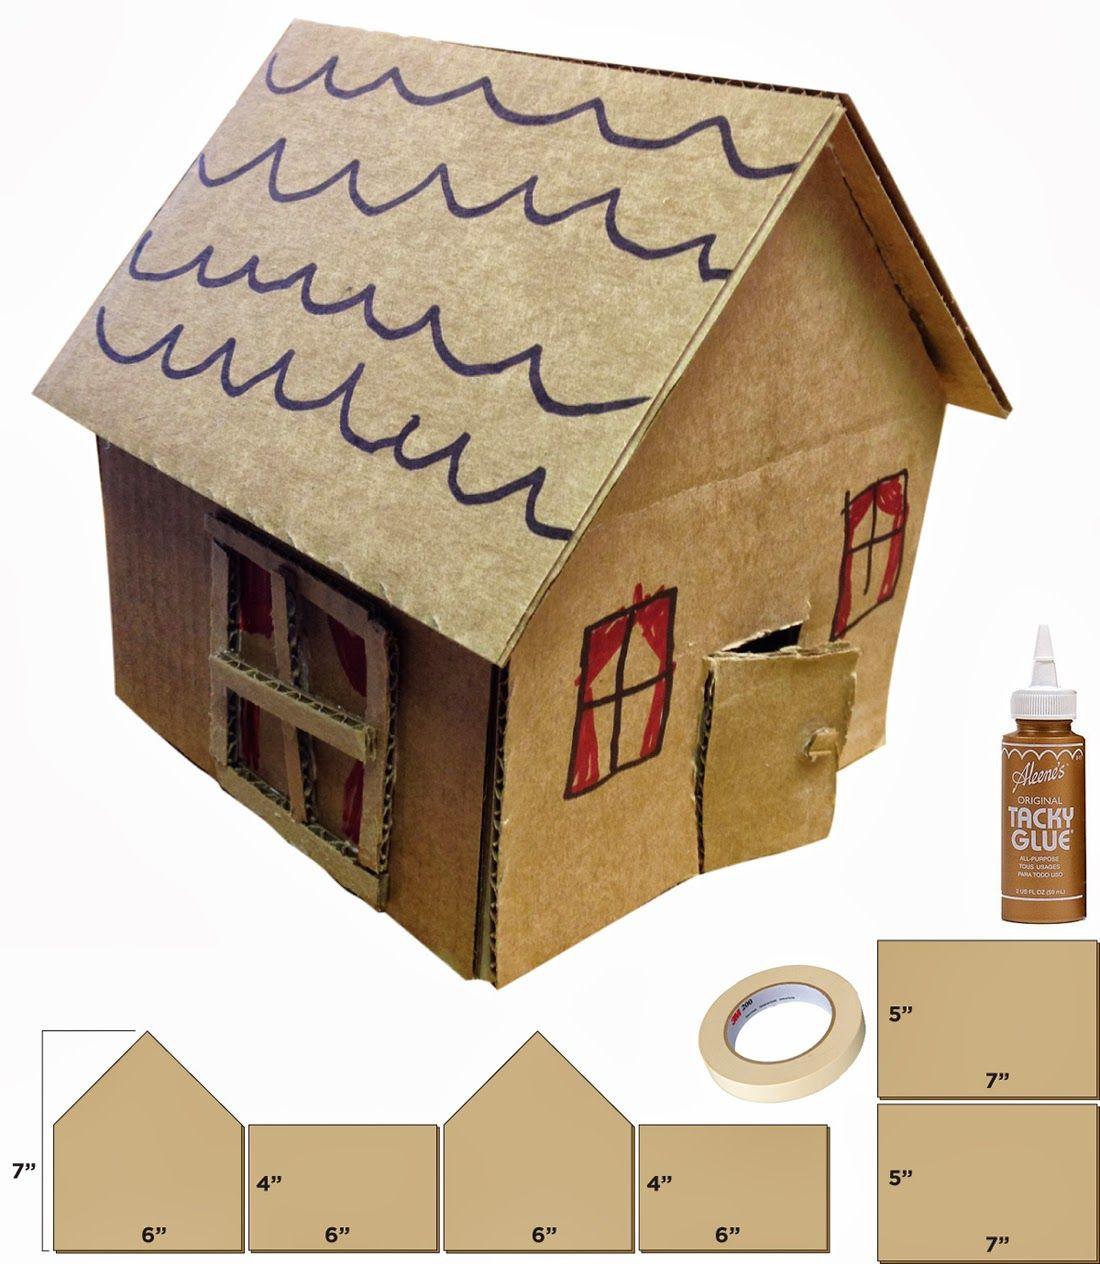 Little Cardboard House Cardboard Houses For Kids